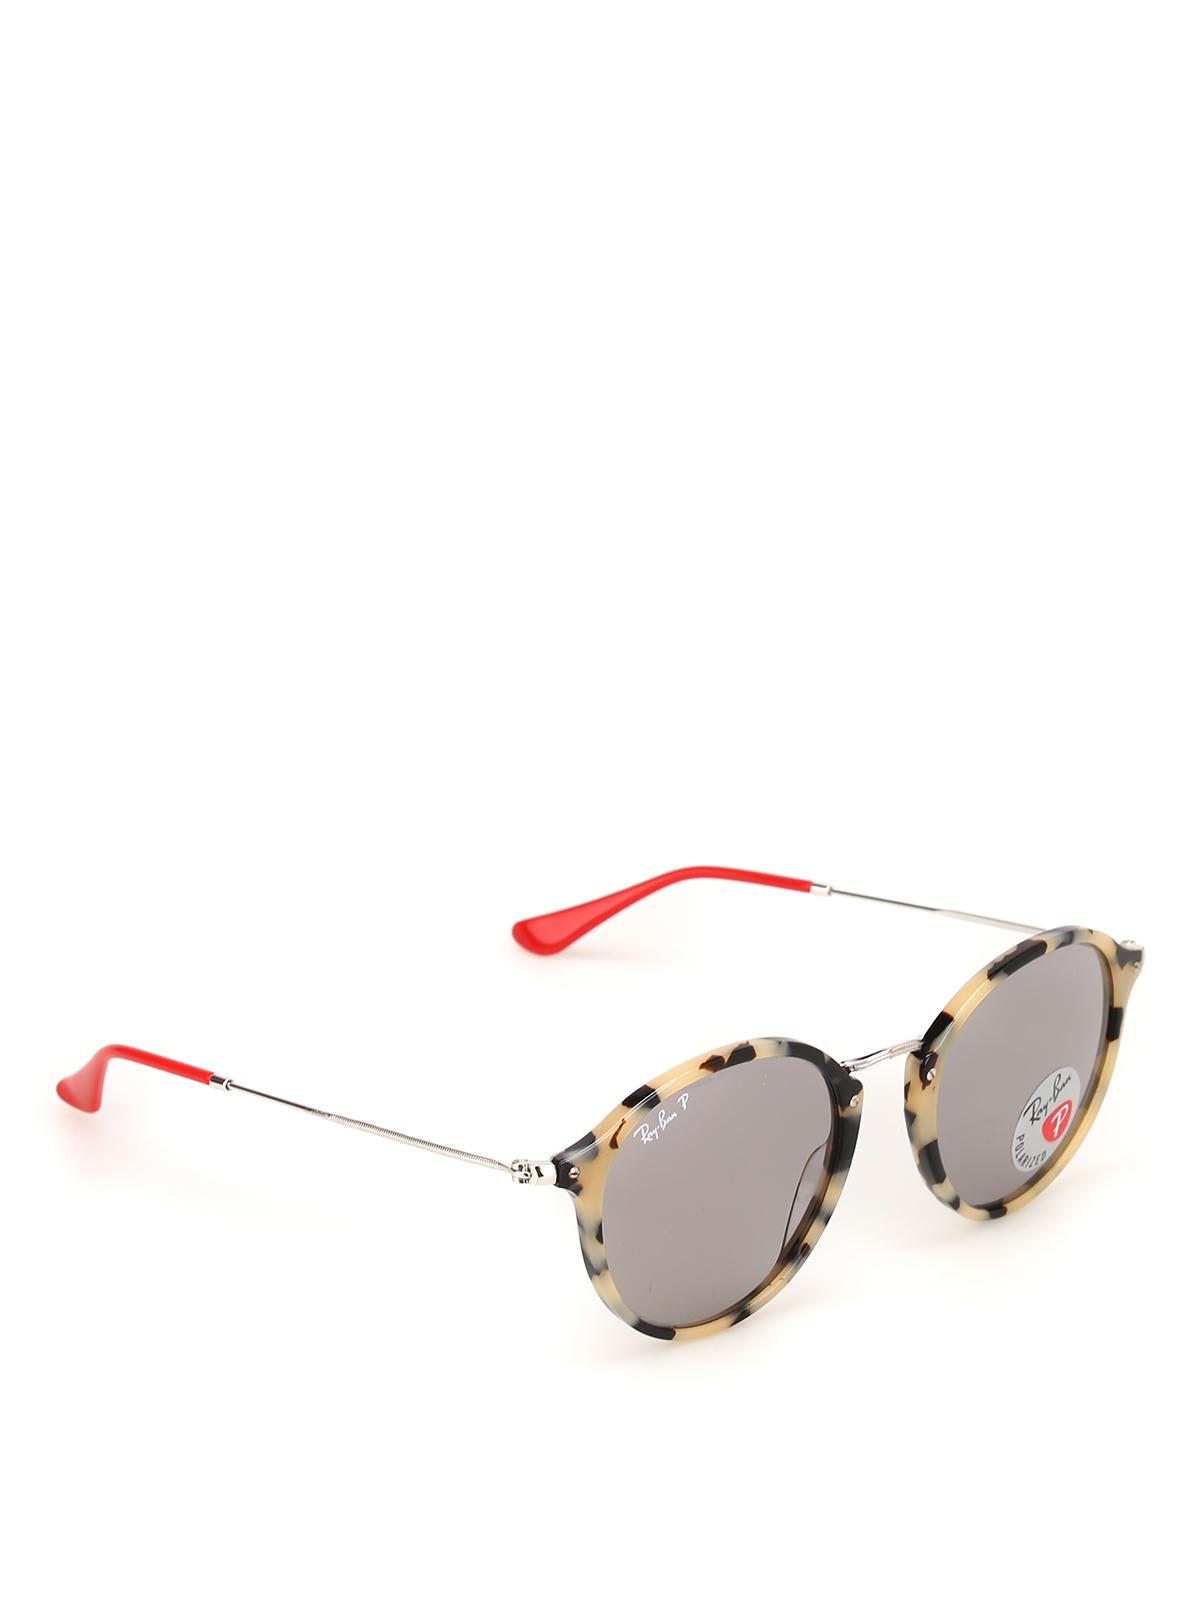 Ray Ban Occhiali da sole rotondi tartarugati occhiali da